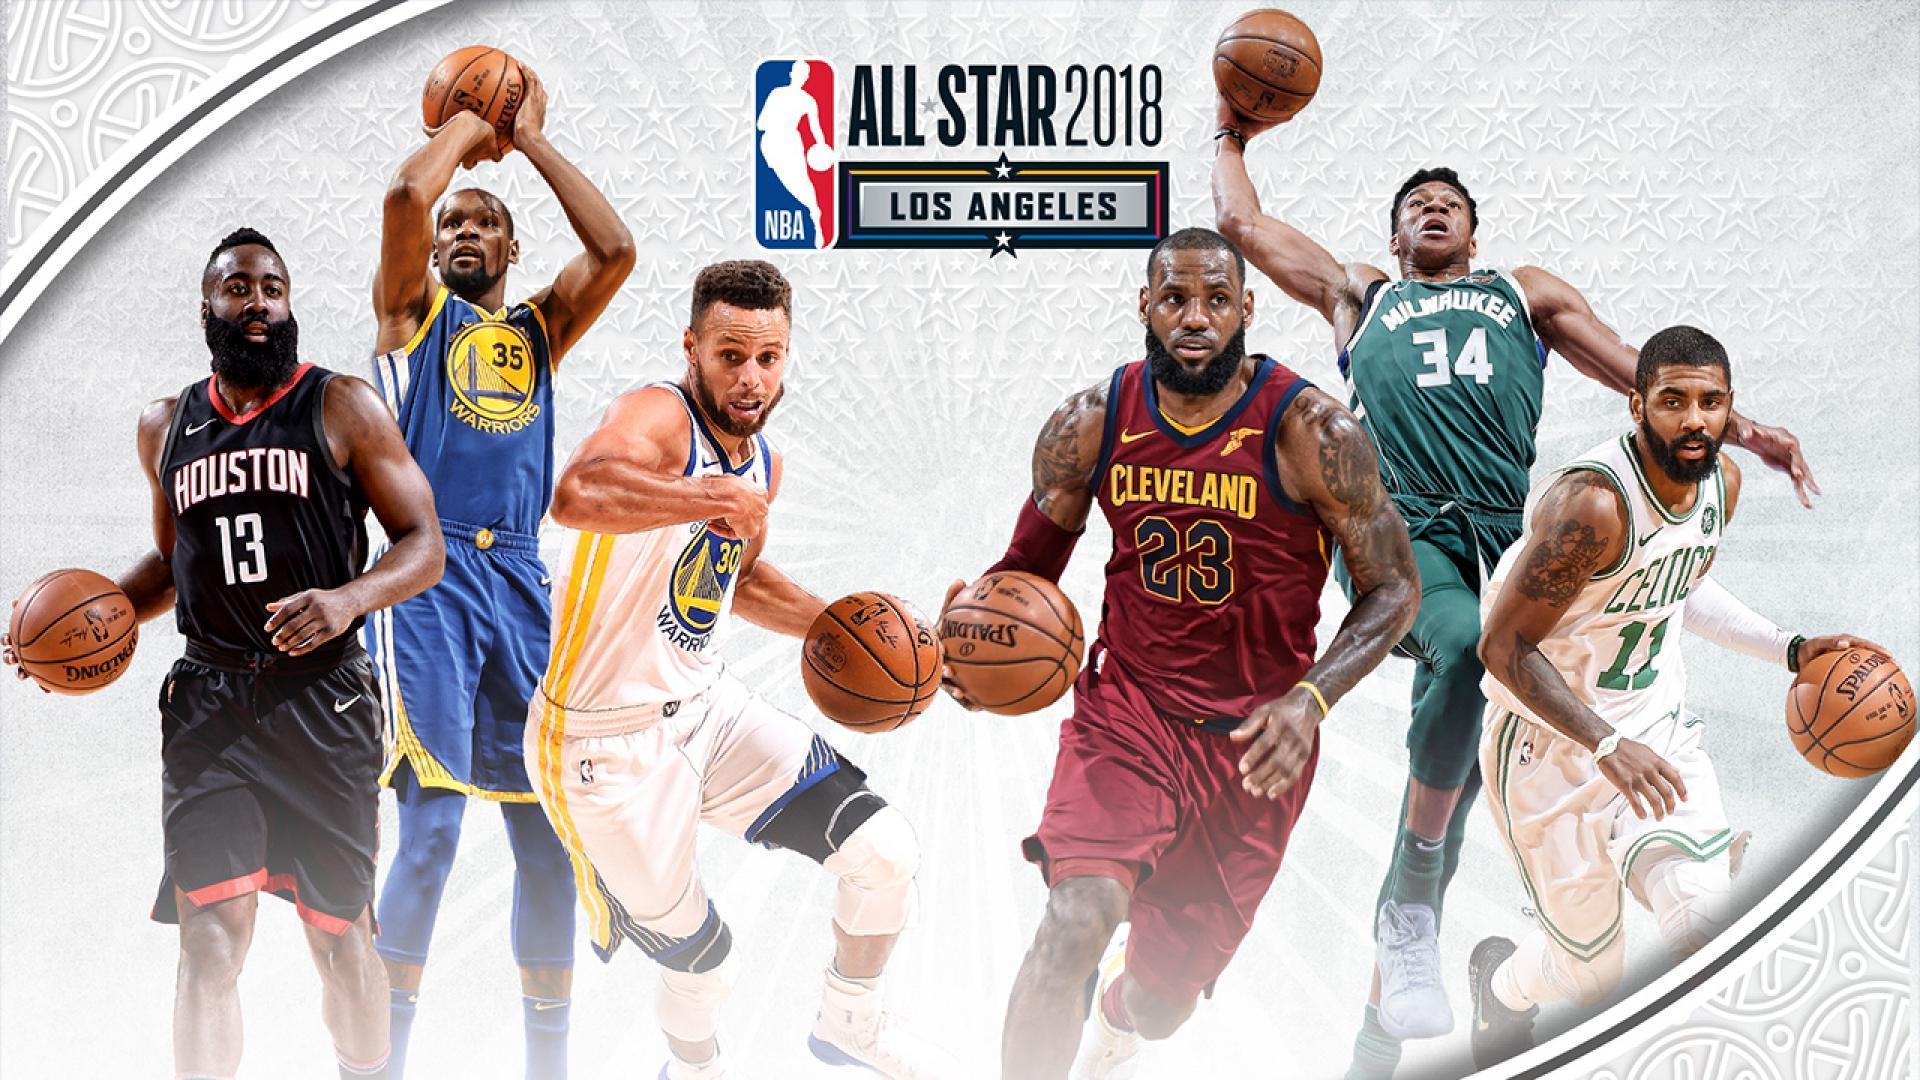 NBA All Star 2018 Wallpapers - Wallpaper Cave